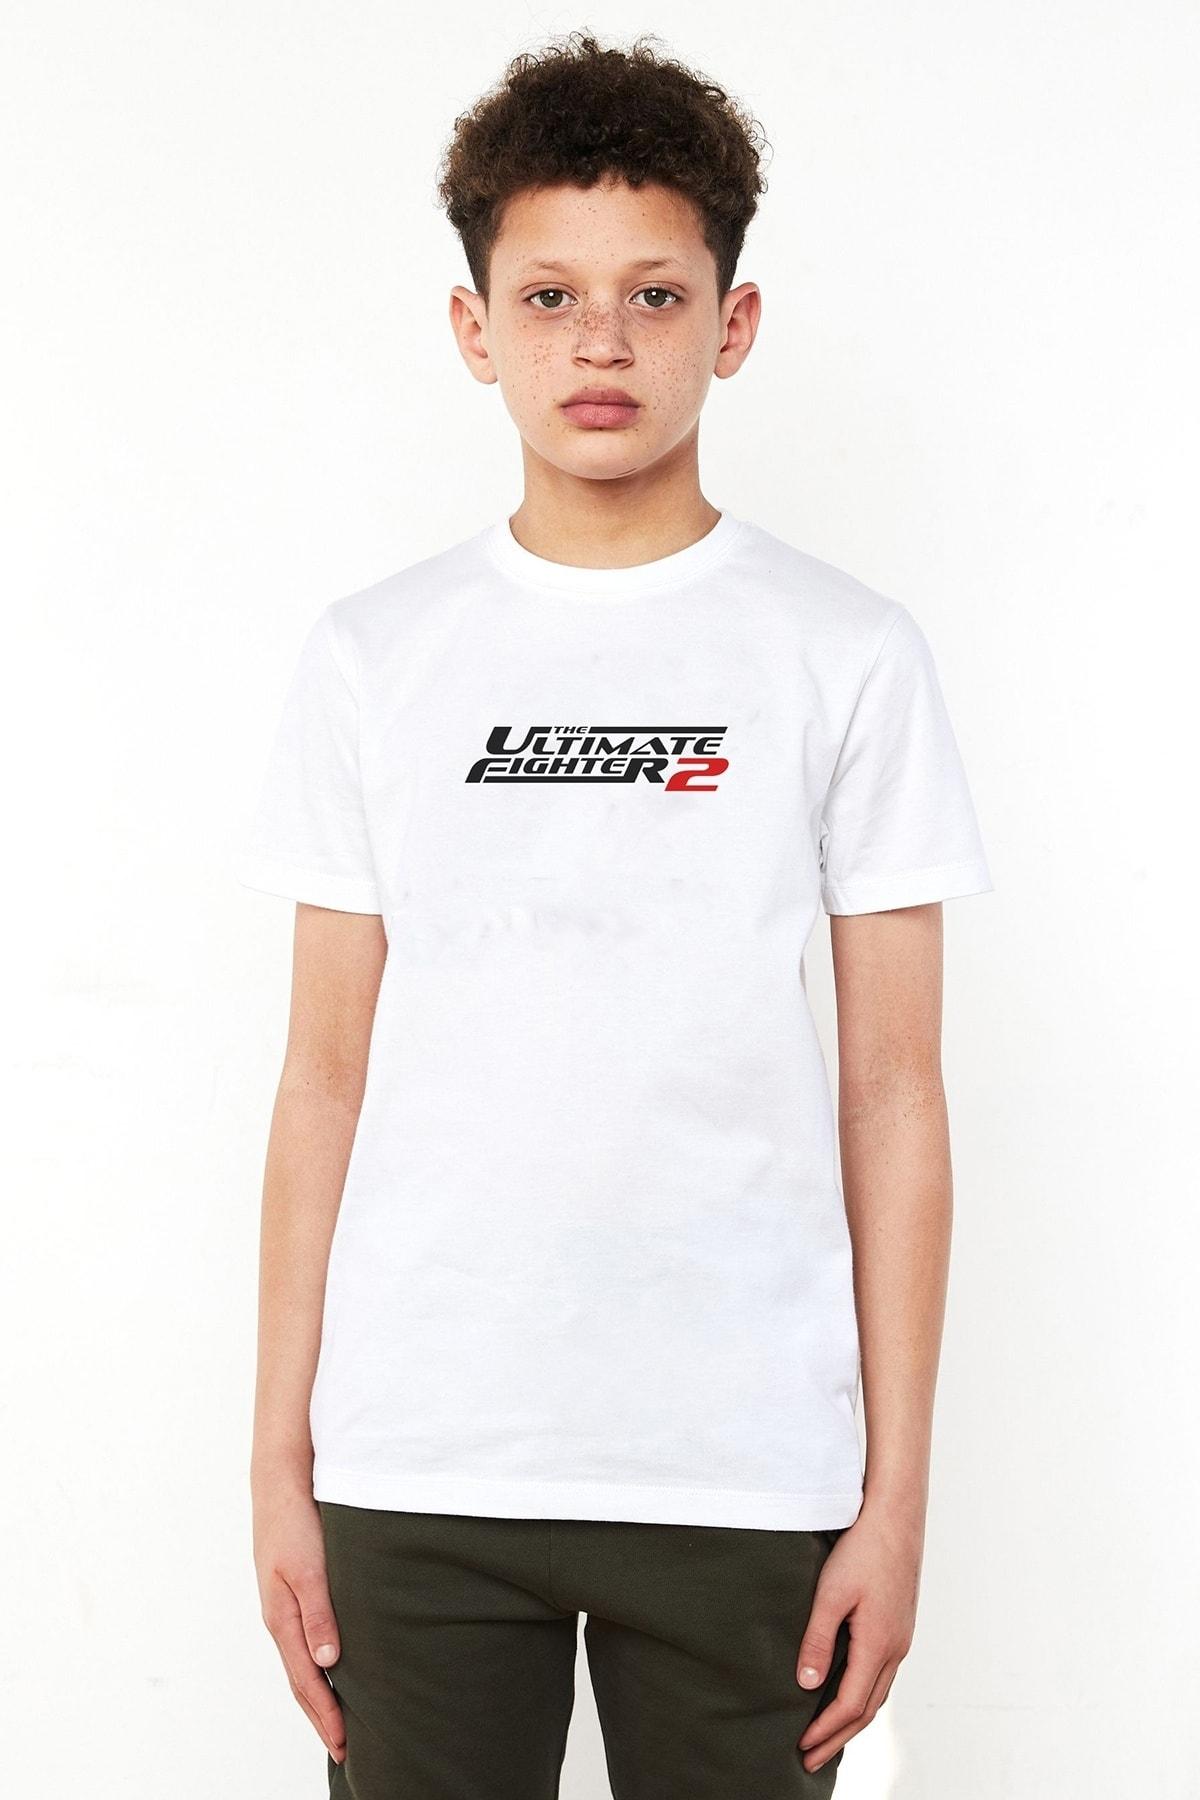 QIVI Unisex Çocuk Beyaz Ufc Ultimate Fighting Championship Baskılı Tshirt 1